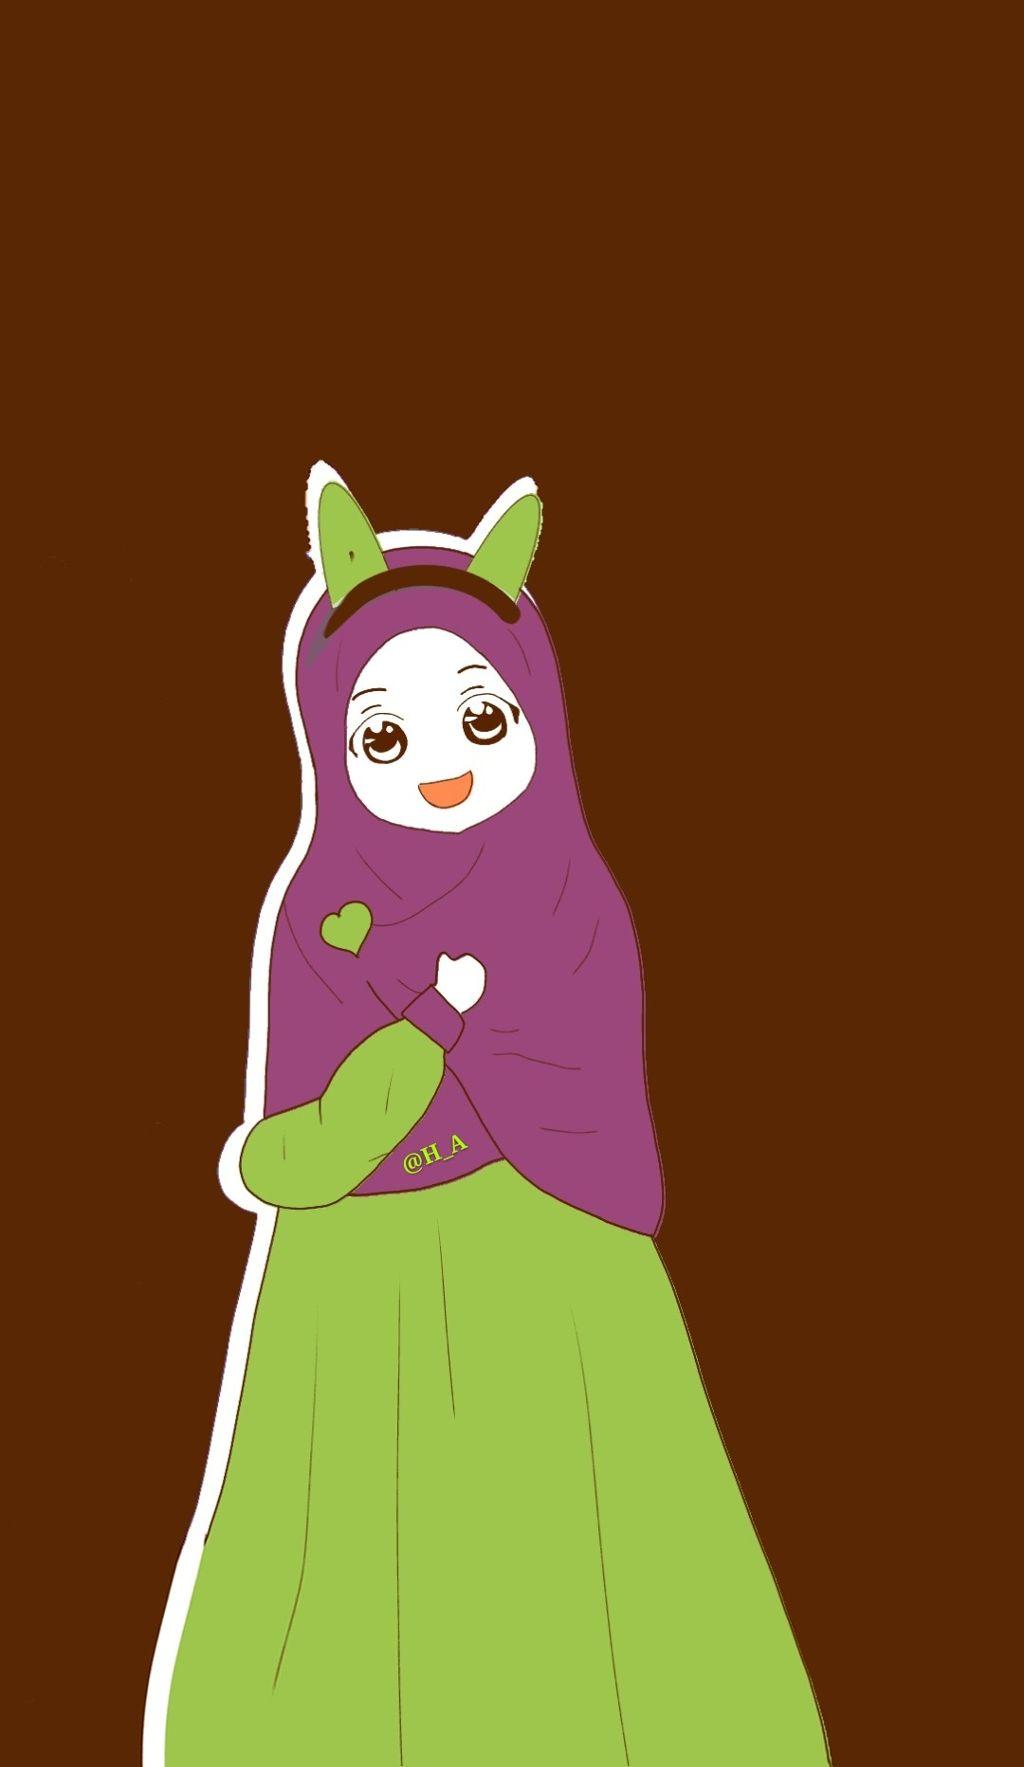 Wallpaper Kartun Hd Muslimah Muslimah Kartun Muslimah 1024x1767 Wallpaper Teahub Io